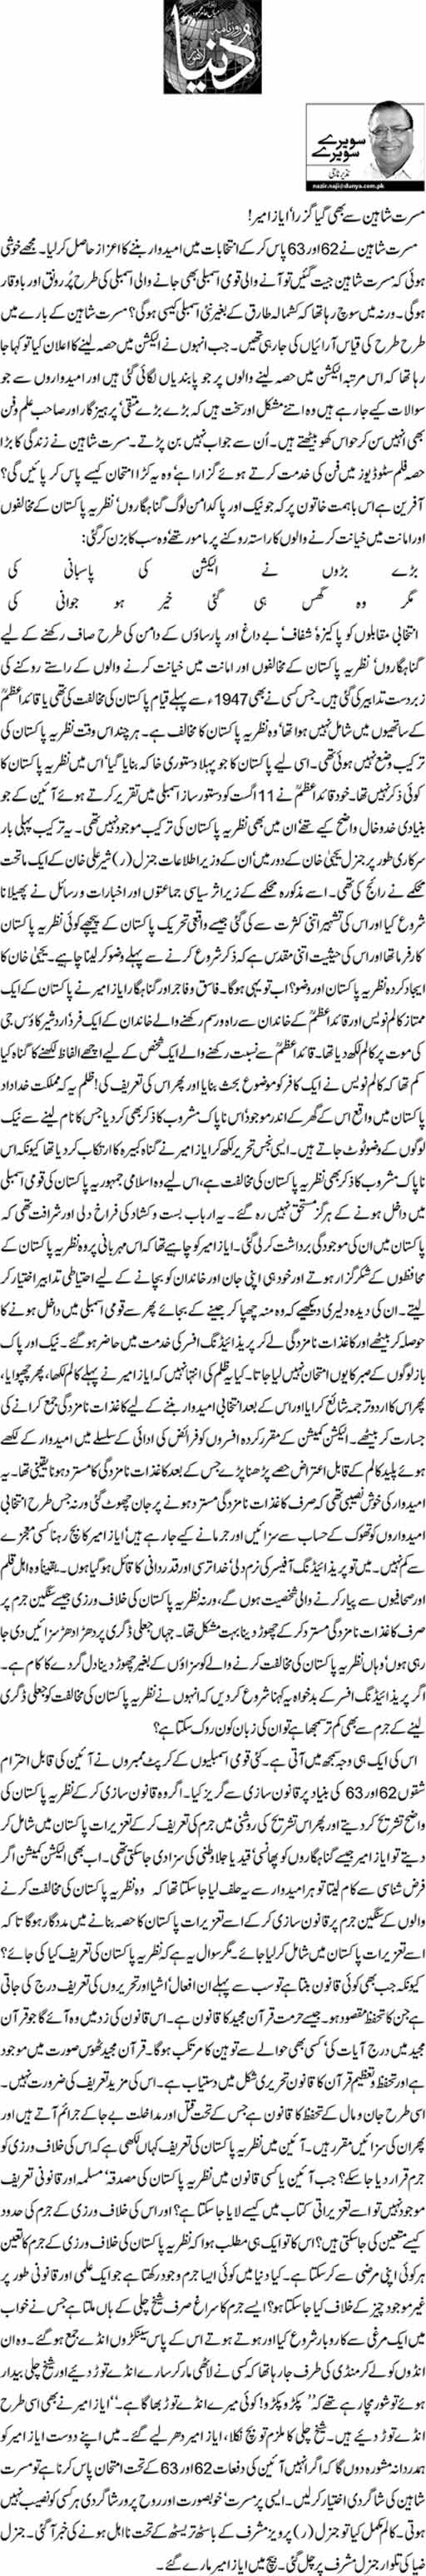 Mussarat Shaheen Se Bhi Gaya Guzra'Ayaz Ameer! - Nazeer Naji